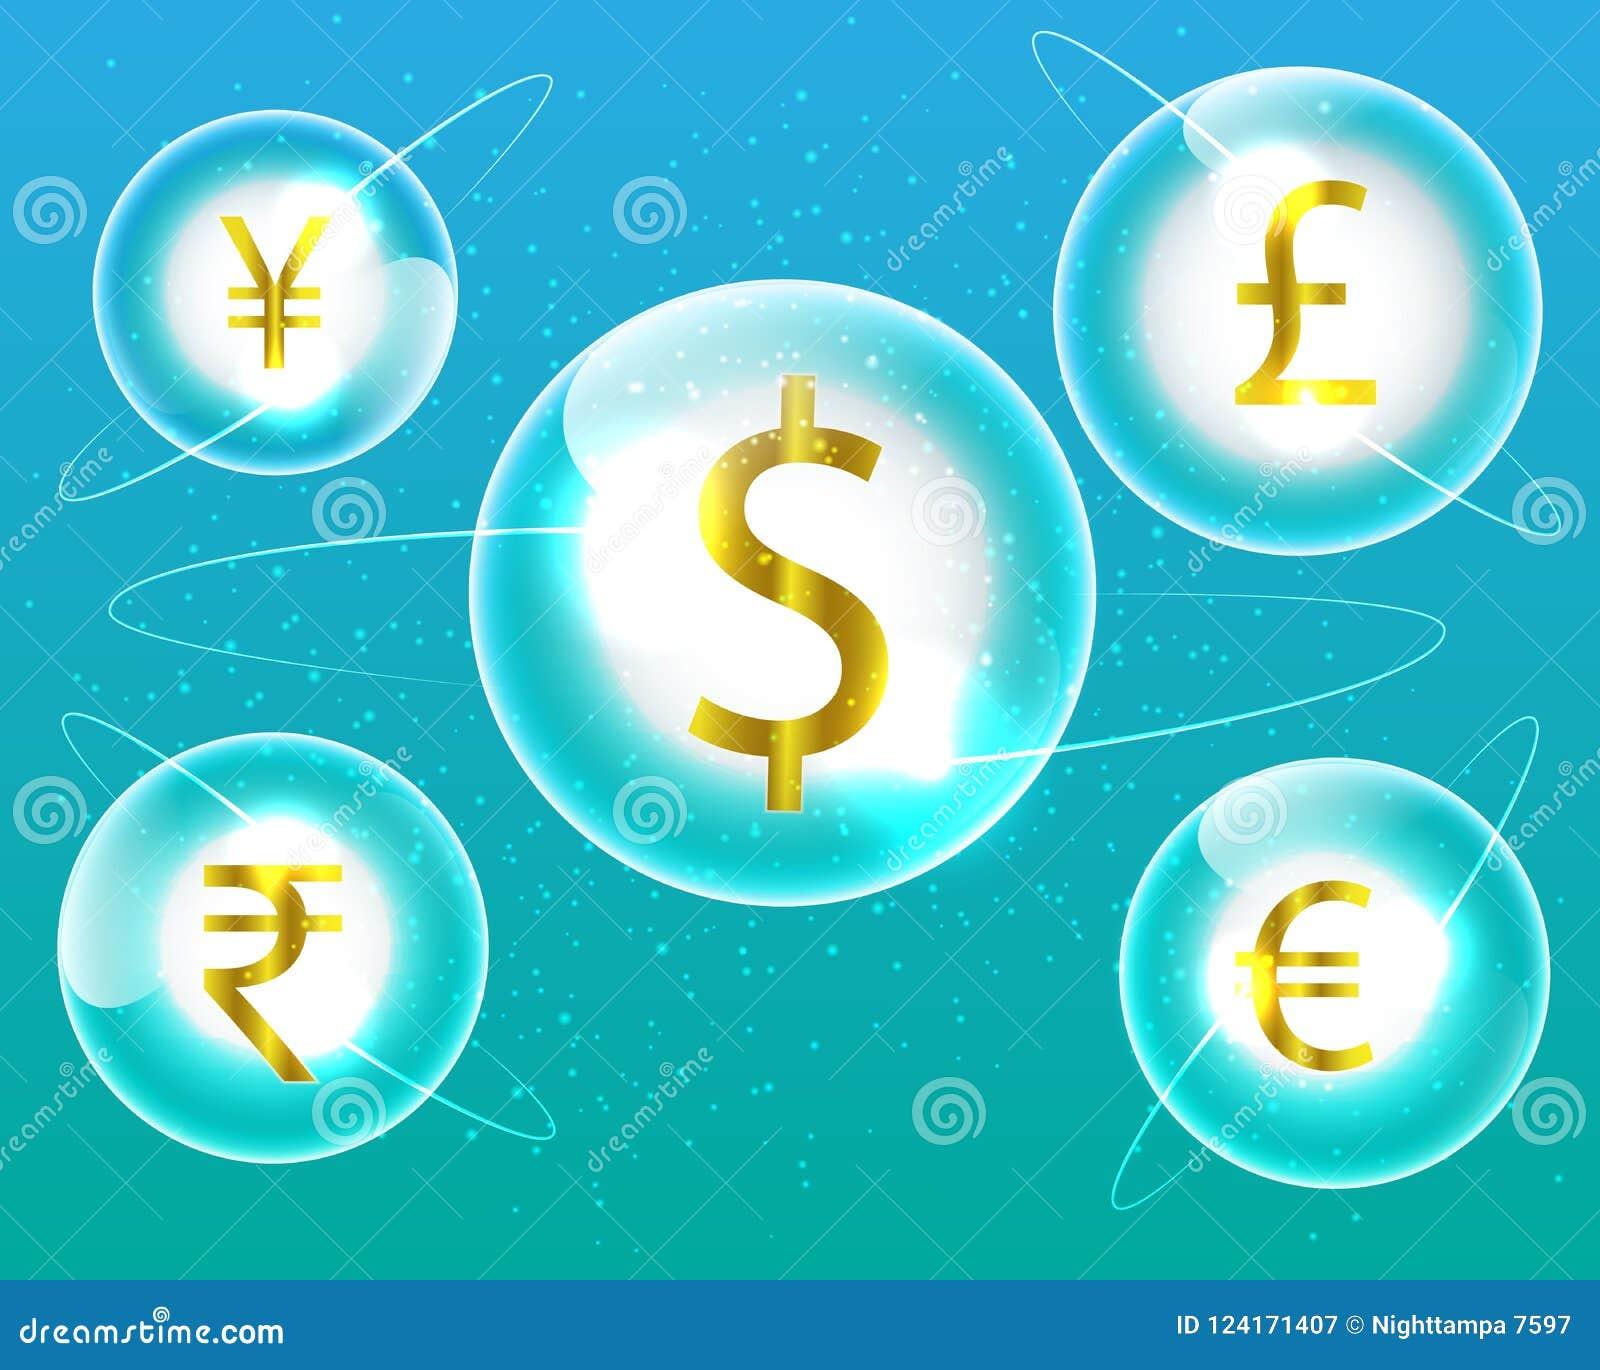 Currency Symbol Dollareurorupeepoundyen Money Exchange Stock